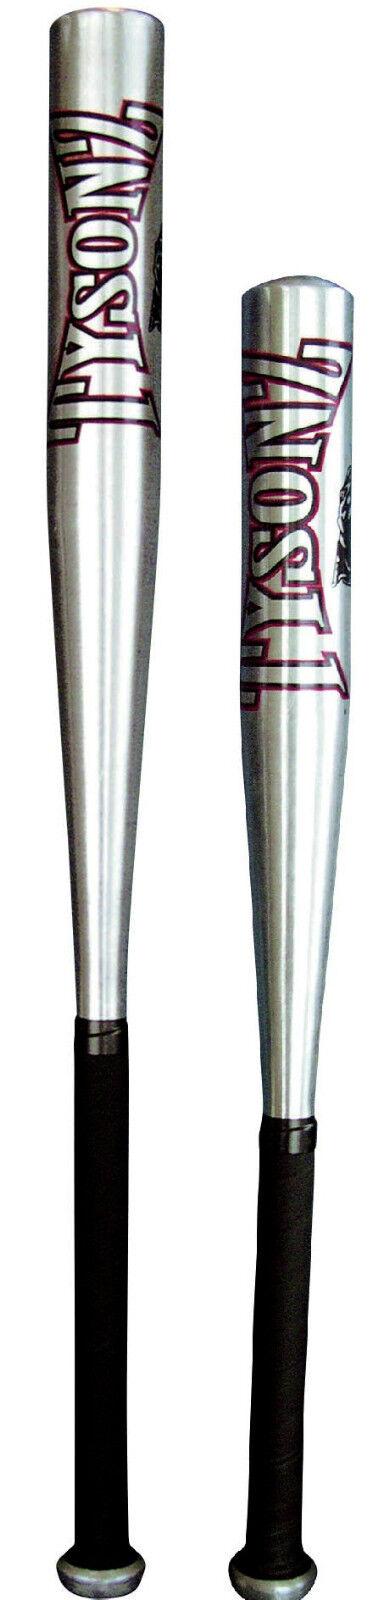 Baseballschläger 32  Aluminium Alu 82 cm BB Schläger Baseball 67 26   Sport cce8aa